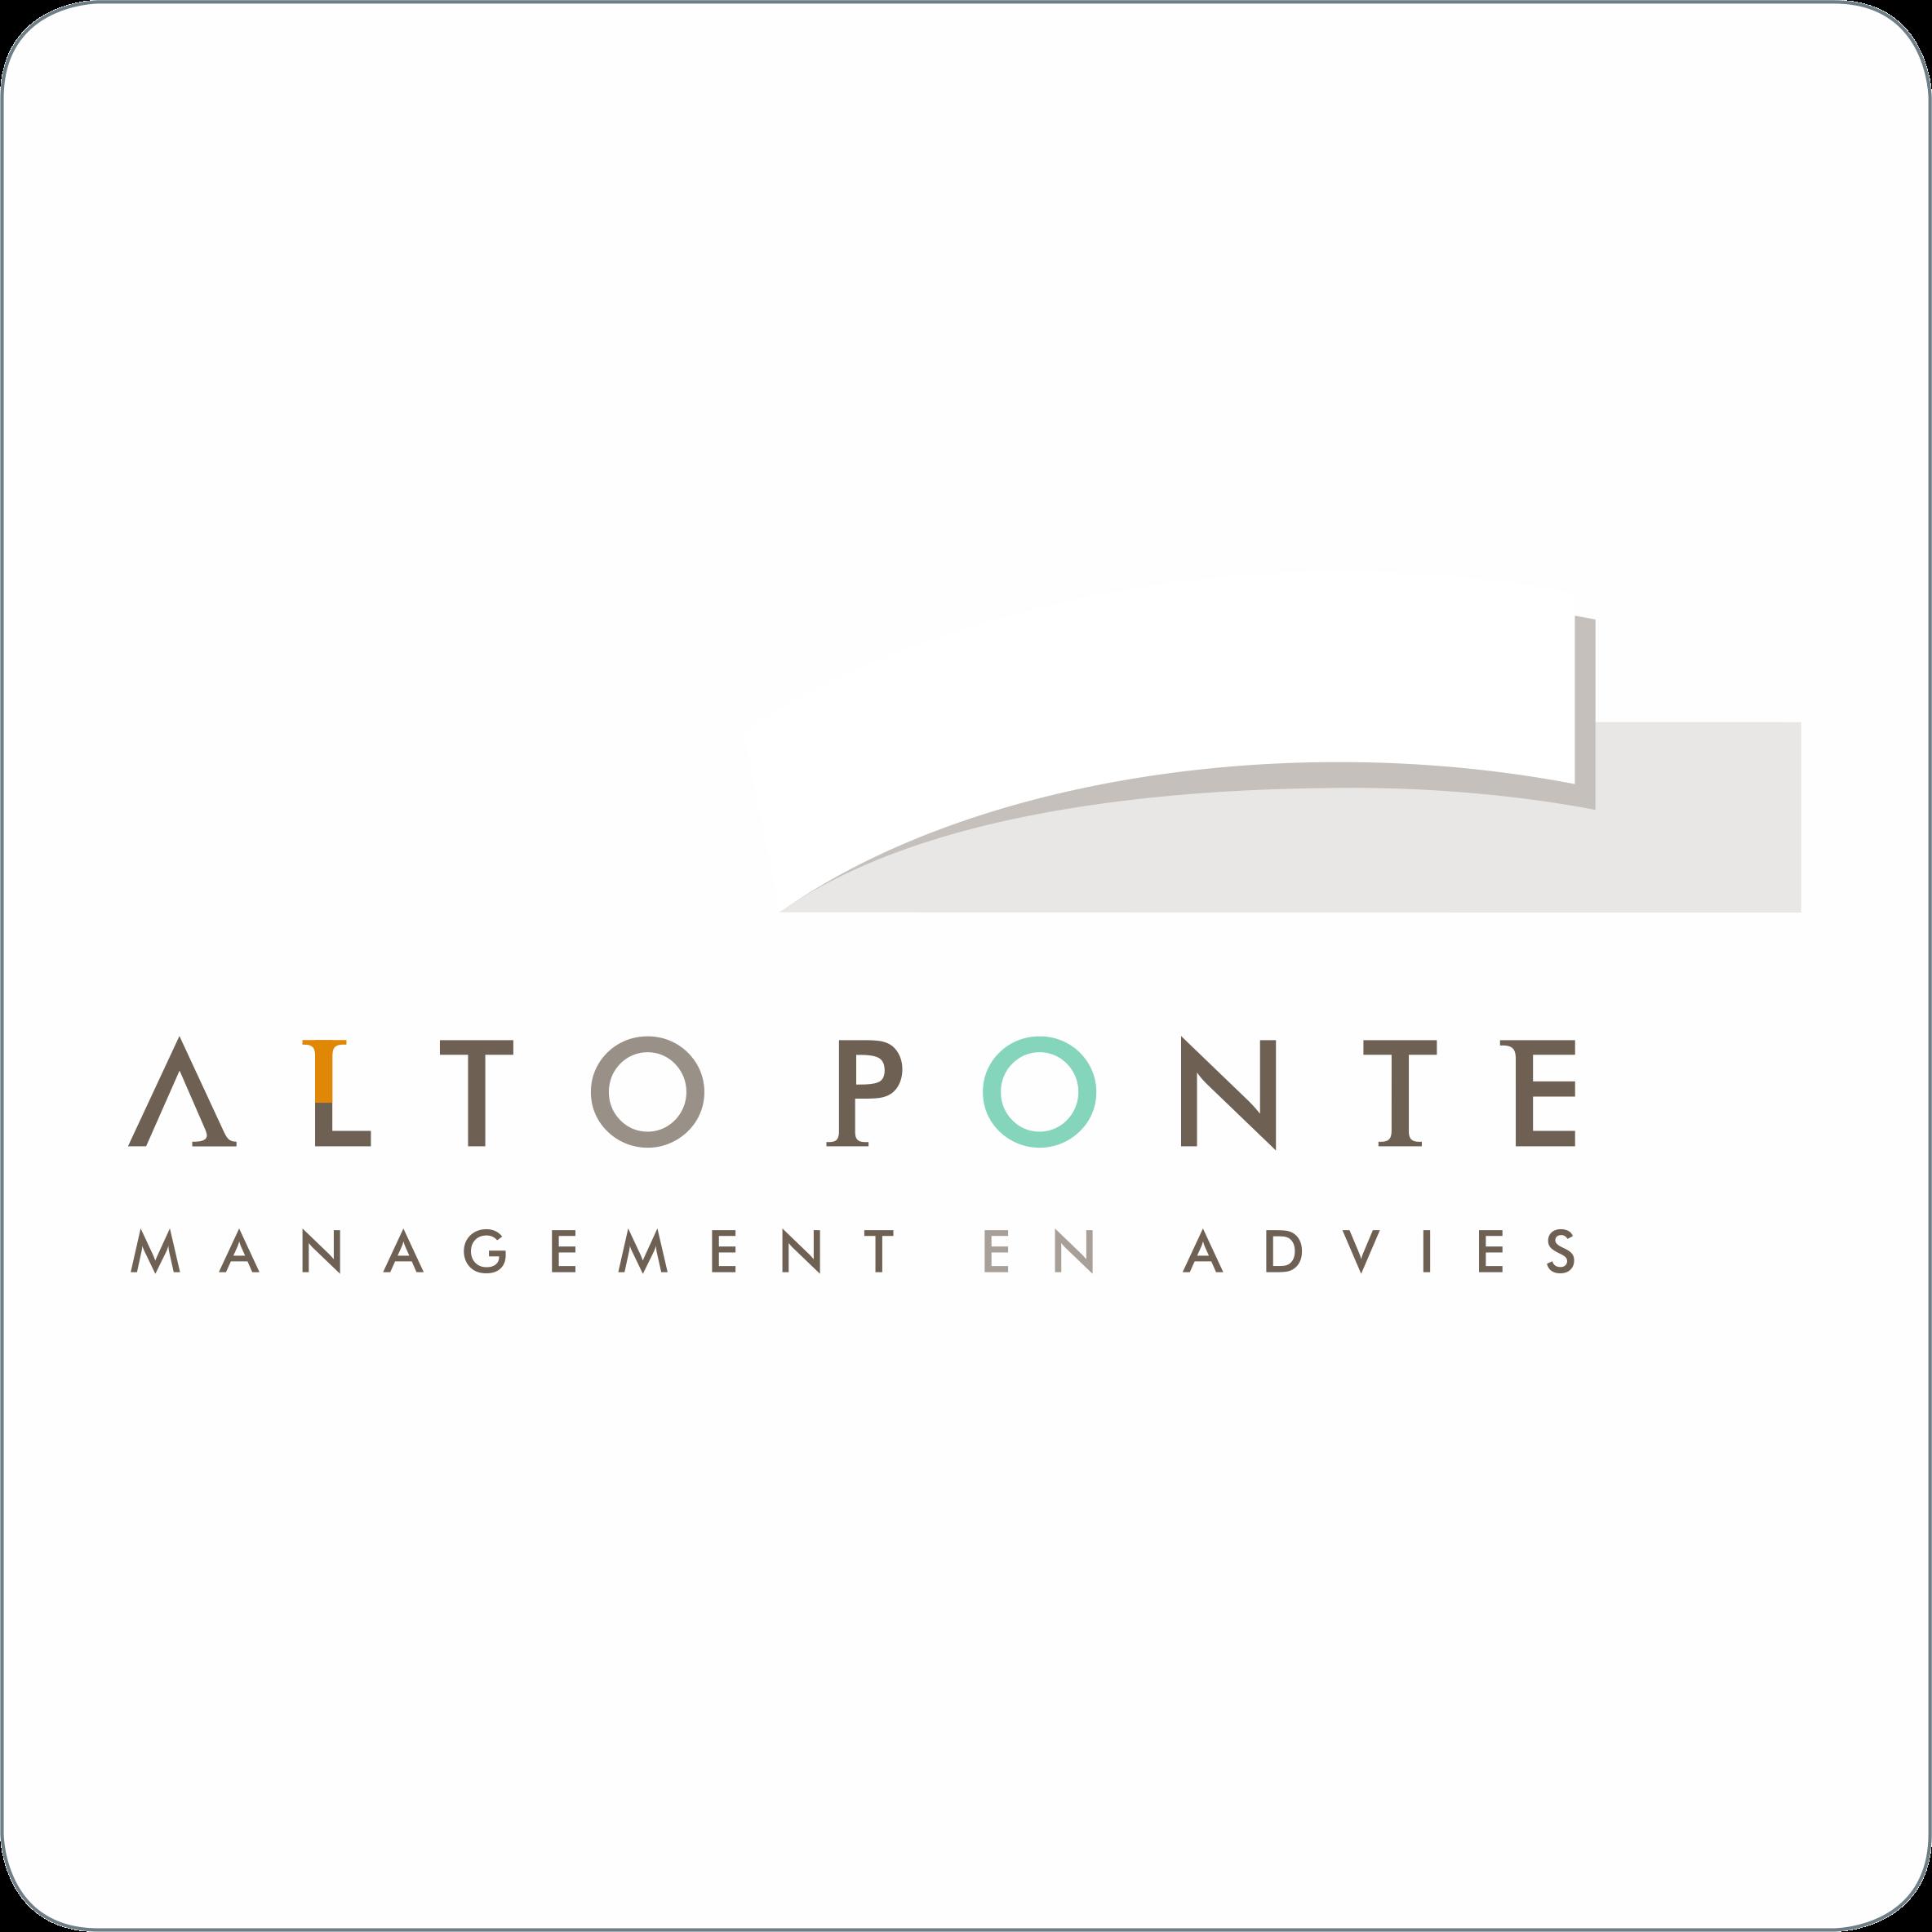 Altoponte